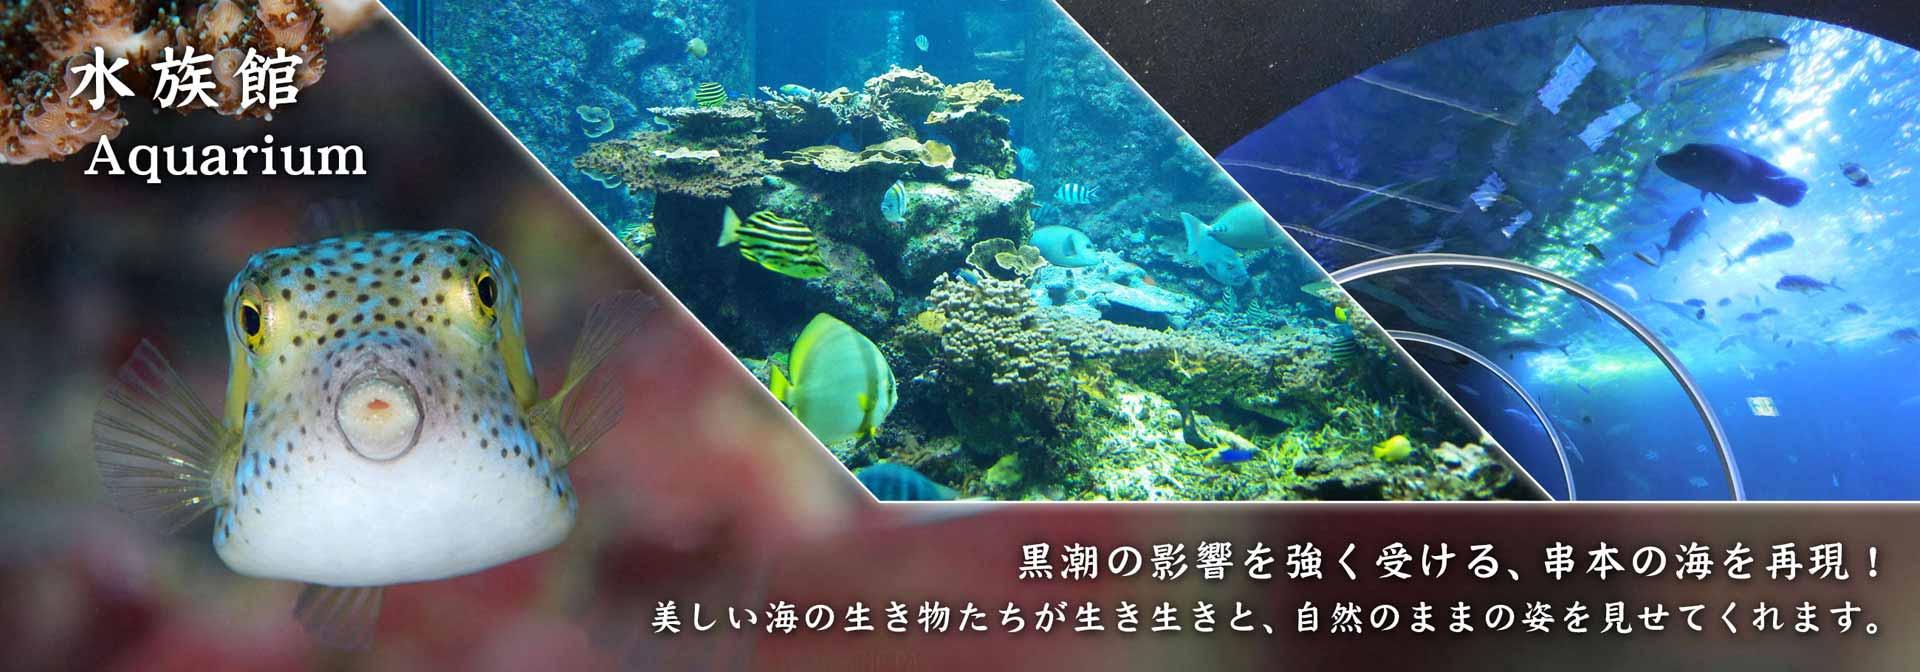 水族館  Aquarium